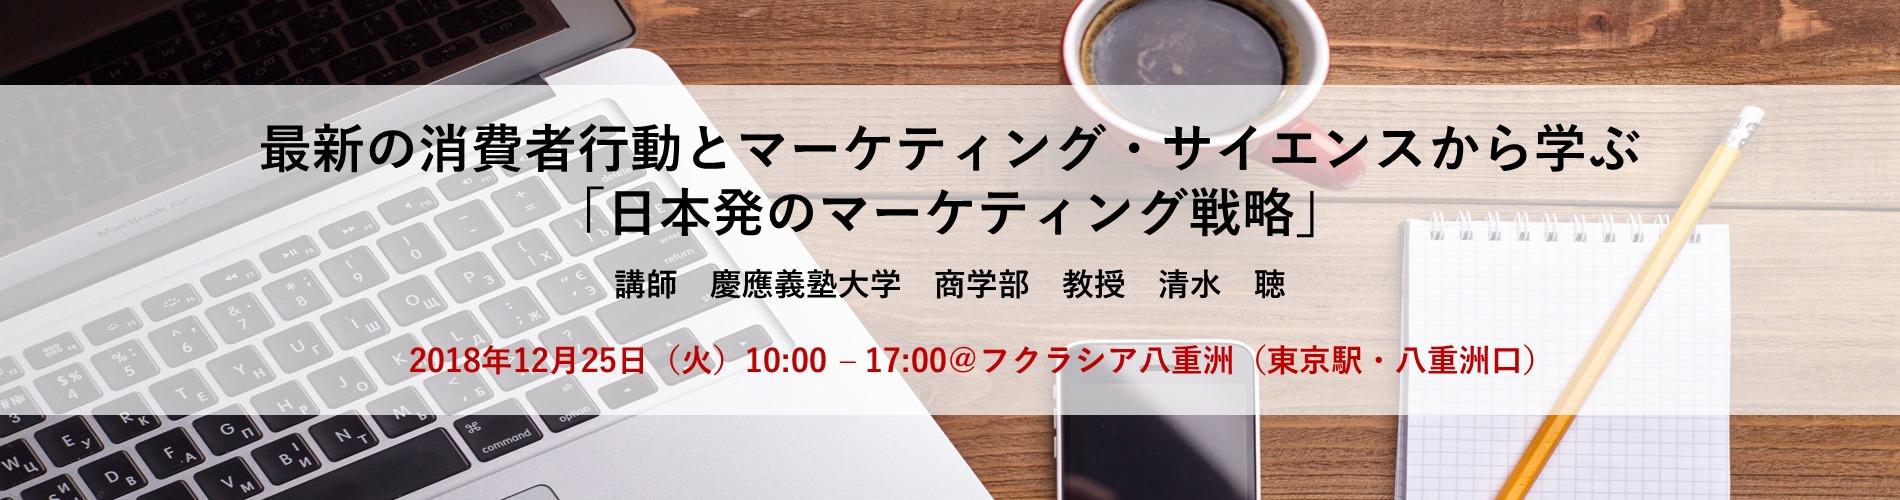 【Marketing Executive Seminar Vol.3】 最新の消費者行動とマーケティング・サイエンスから学ぶ 「日本発のマーケティング戦略」